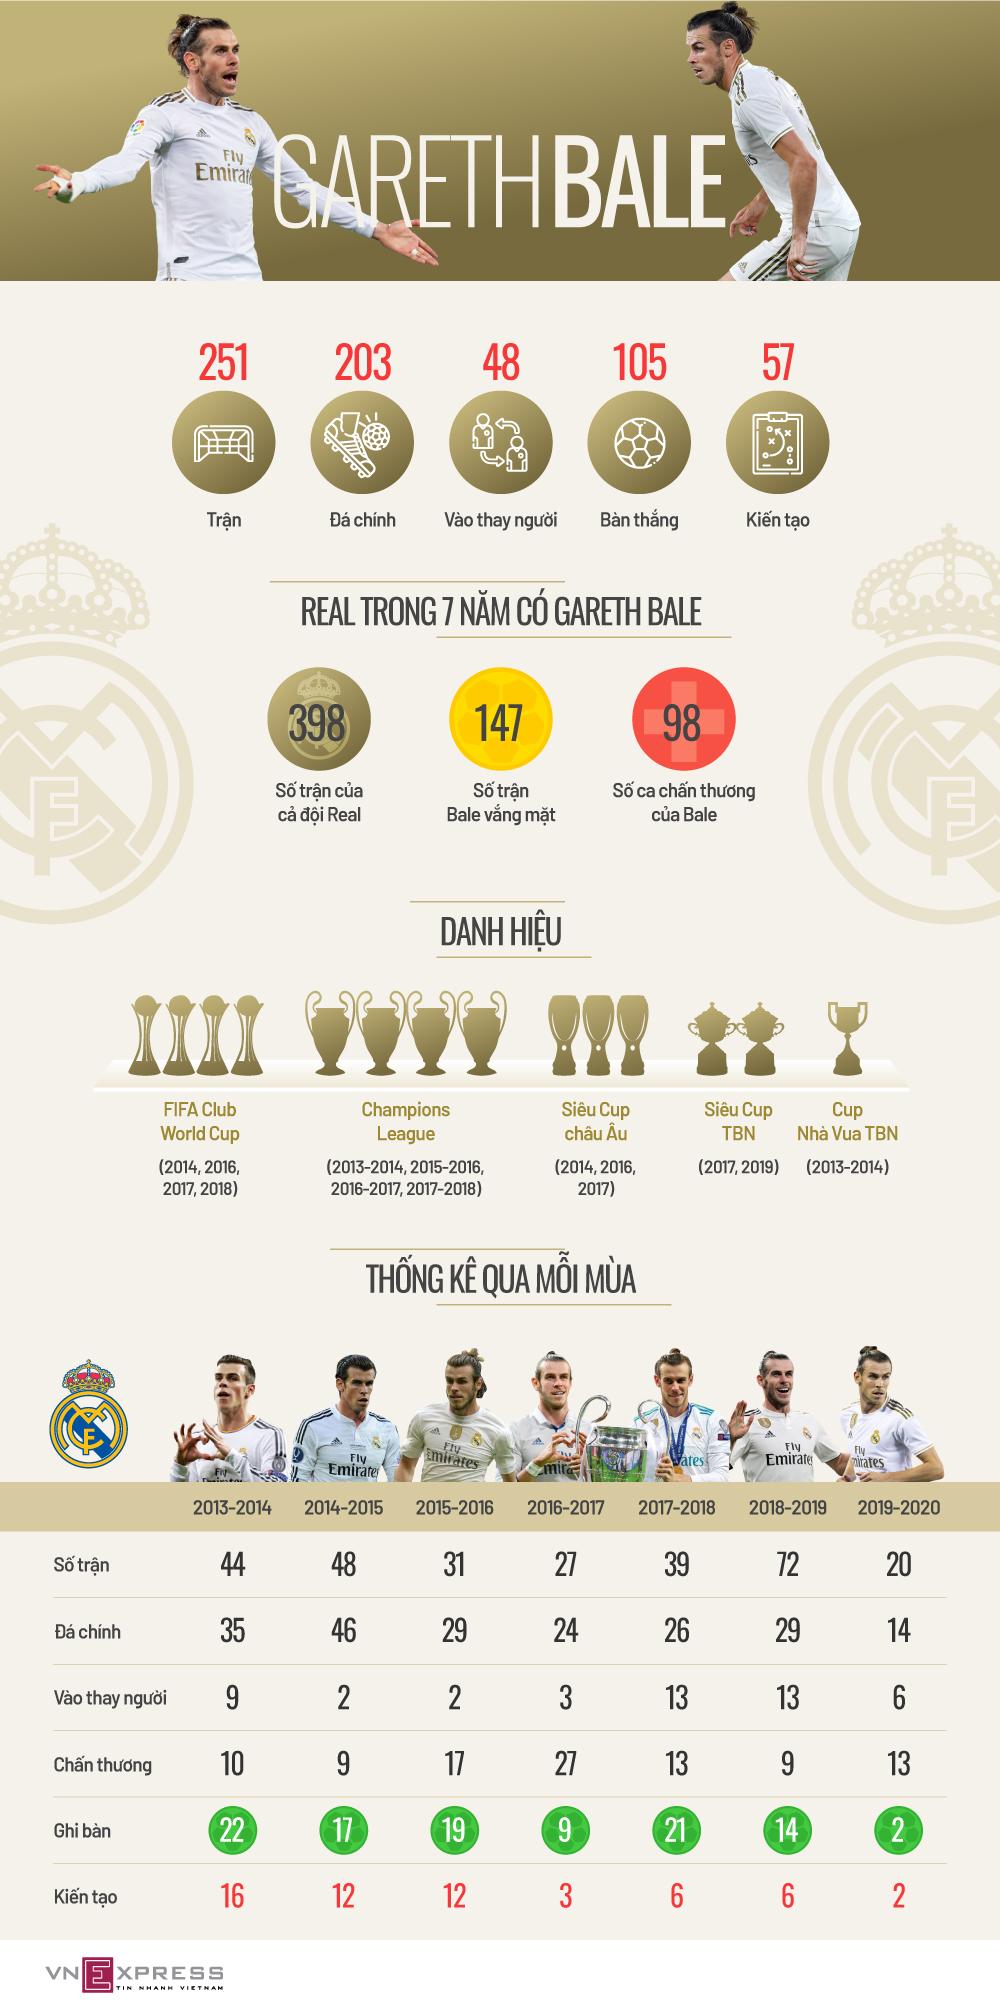 Bảy năm của Gareth Bale ở Real